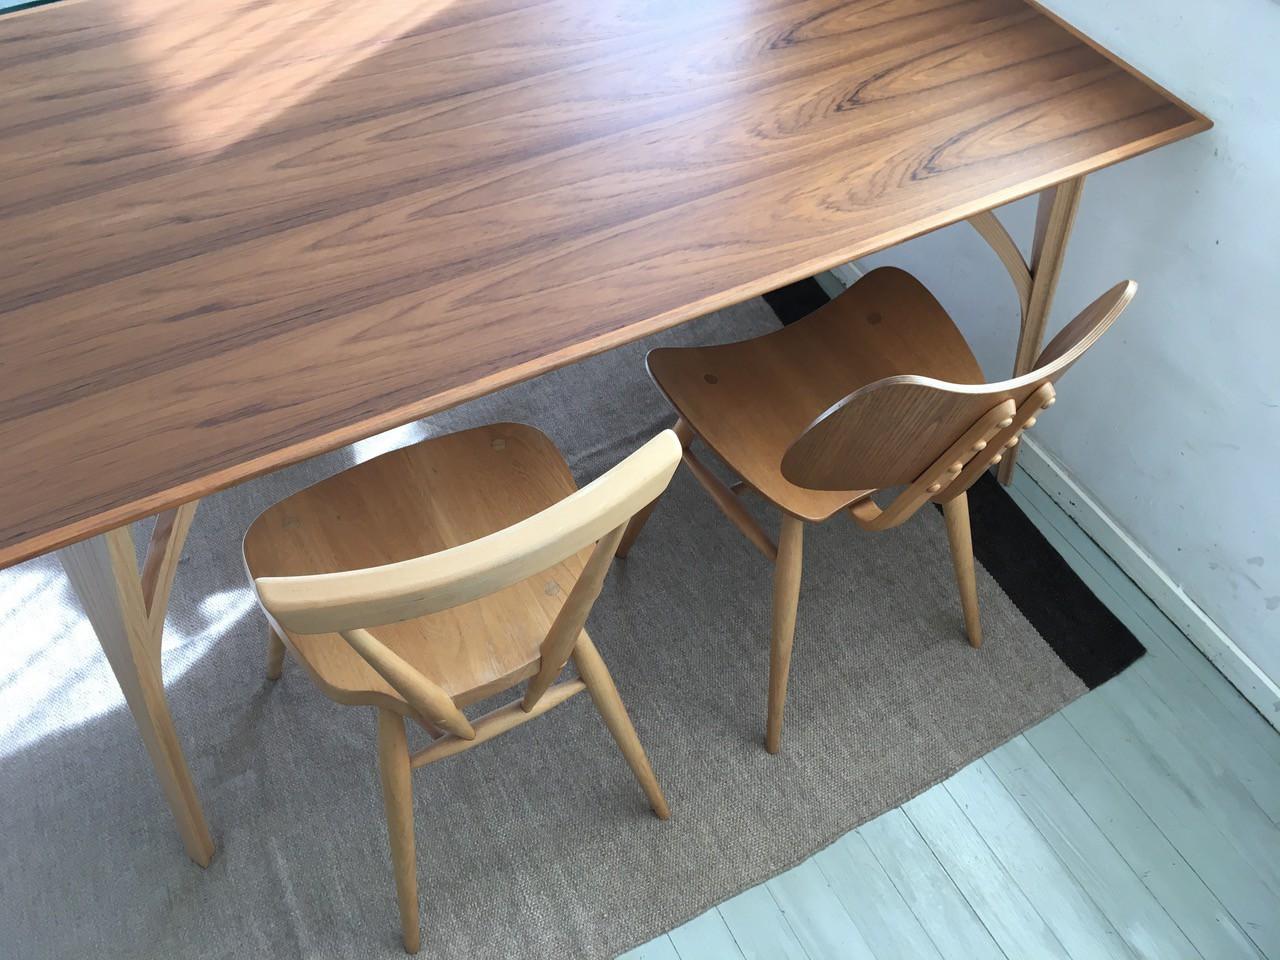 DECO-BOCO Original Dining table Desk / デコボコ オリジナルダイニングテーブル デスク チーク×オーク(オーダー コンパクト デスク)150cm